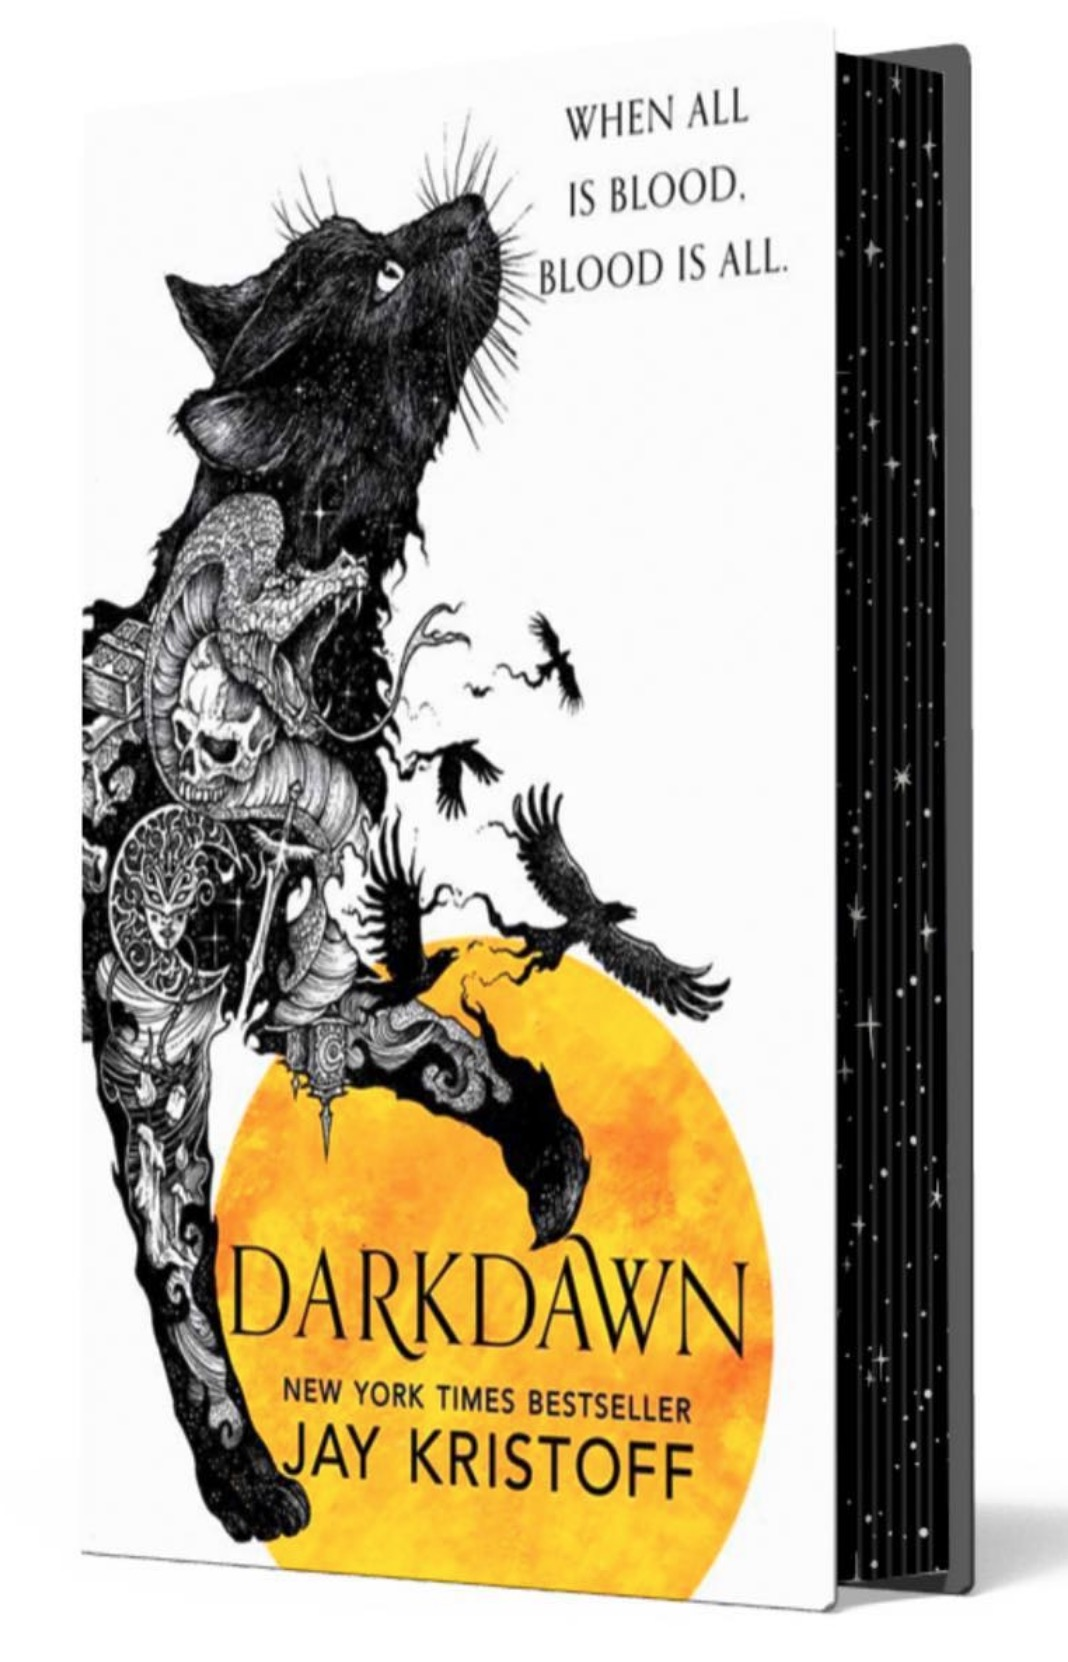 Jay Kristoff Darkdawn sprayed edges